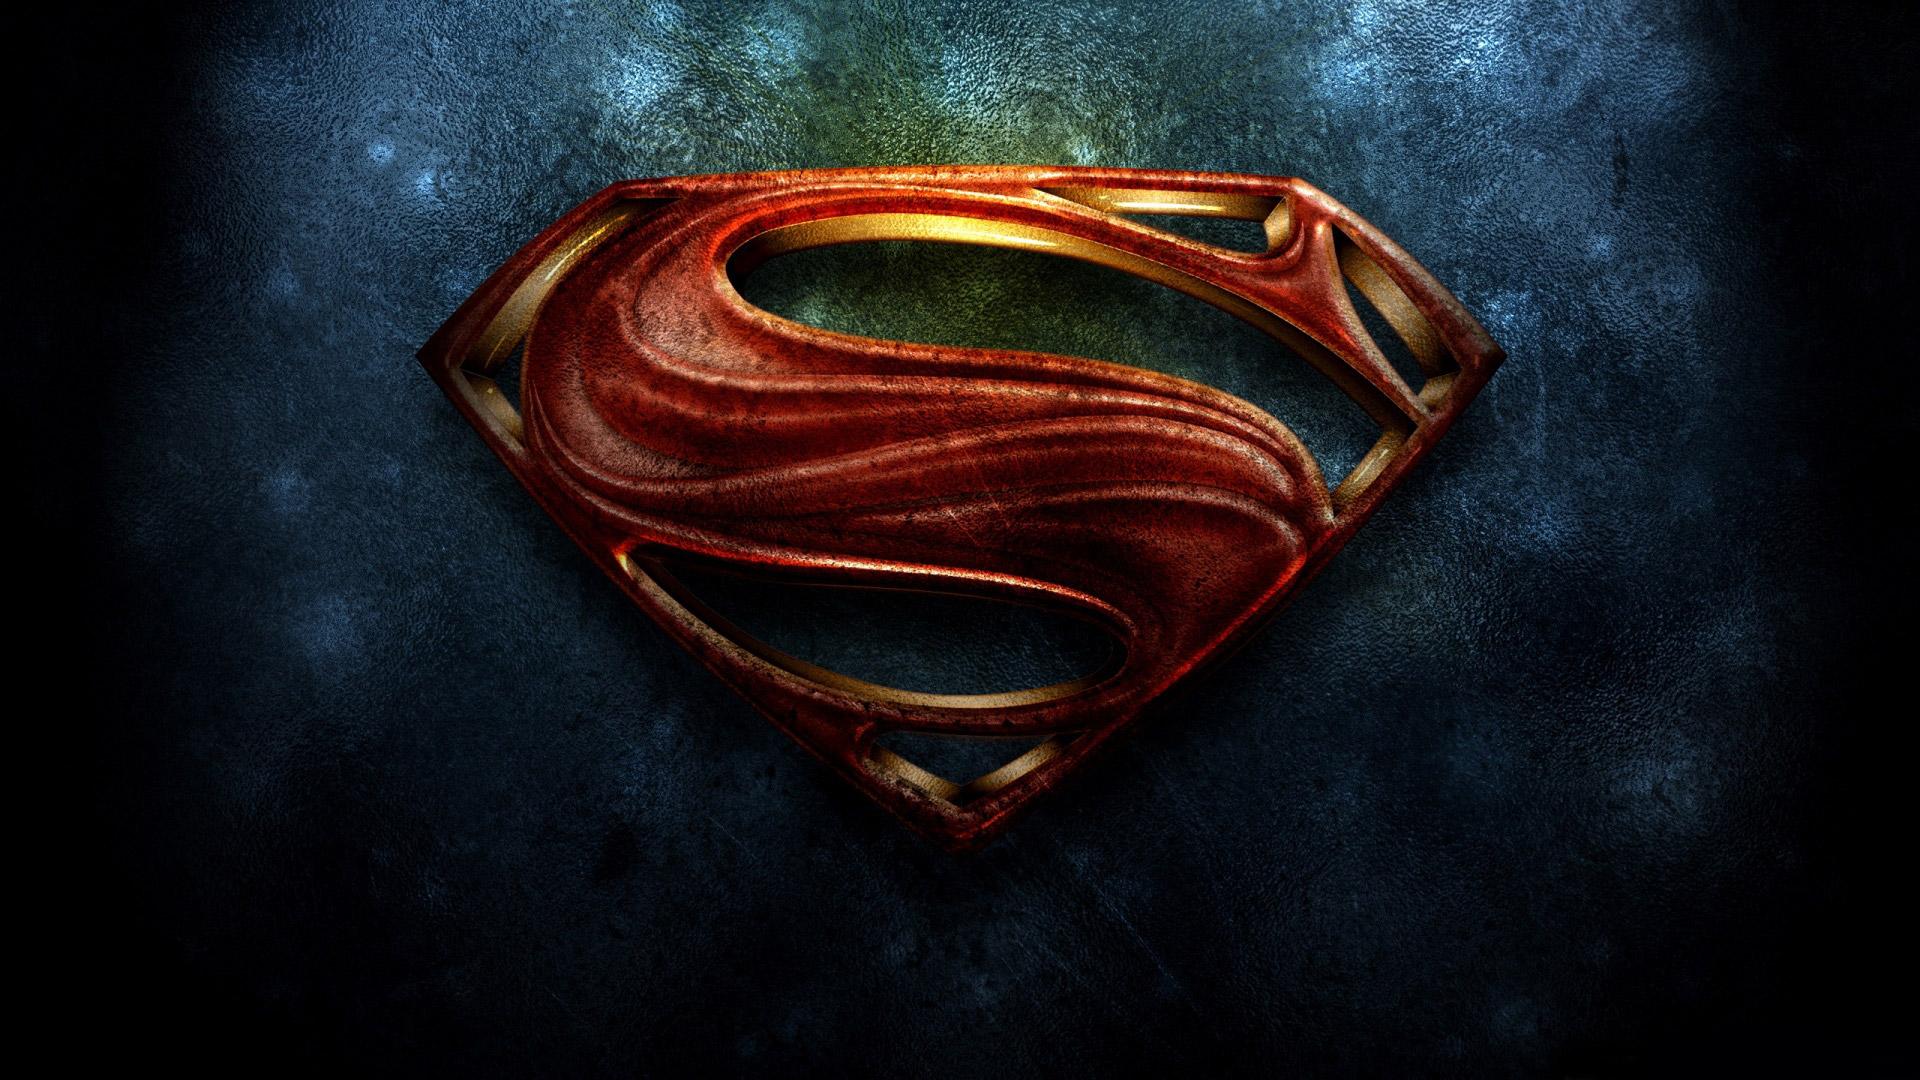 2013 Superman Logo Wallpaper wwwgalleryhipcom   The 1920x1080